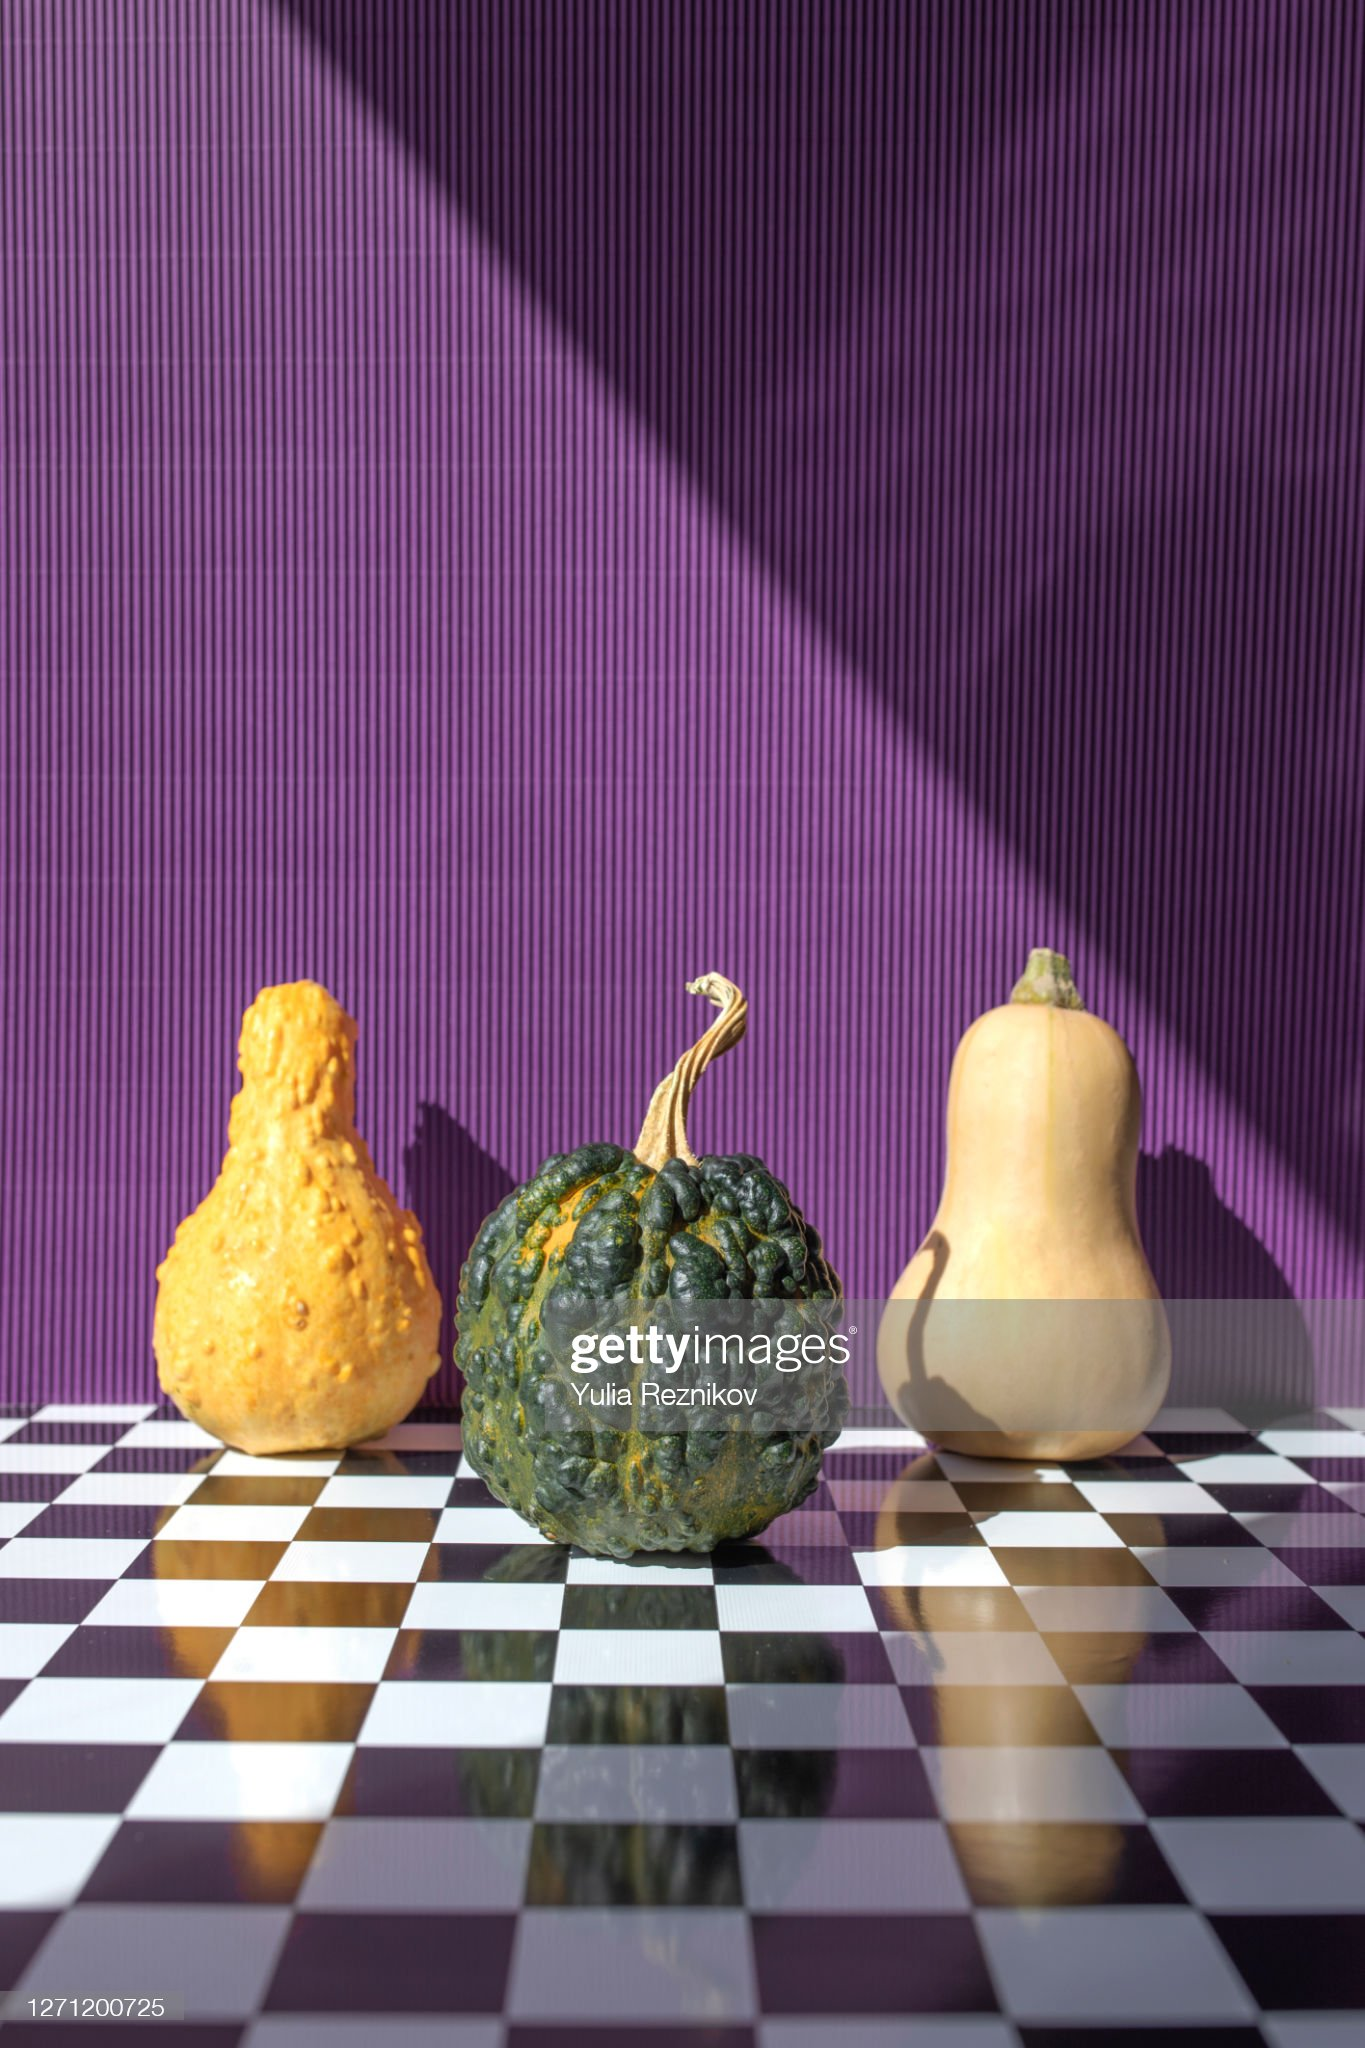 Three pumpkins (crookneck, butternut and black futsu squash) on the purple background : 圖庫照片